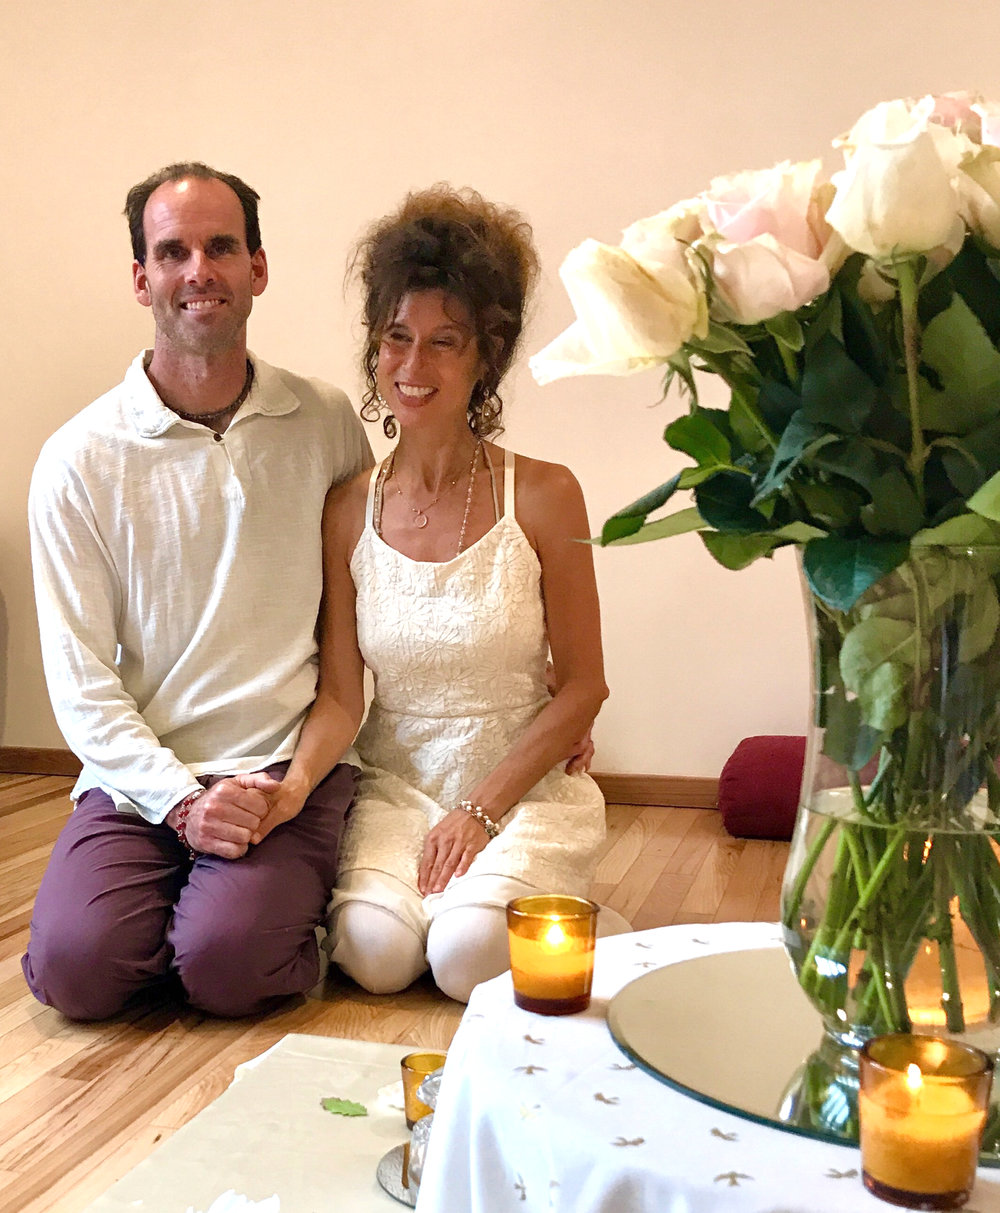 Christopher & Daniela, Yoga Farm Directors